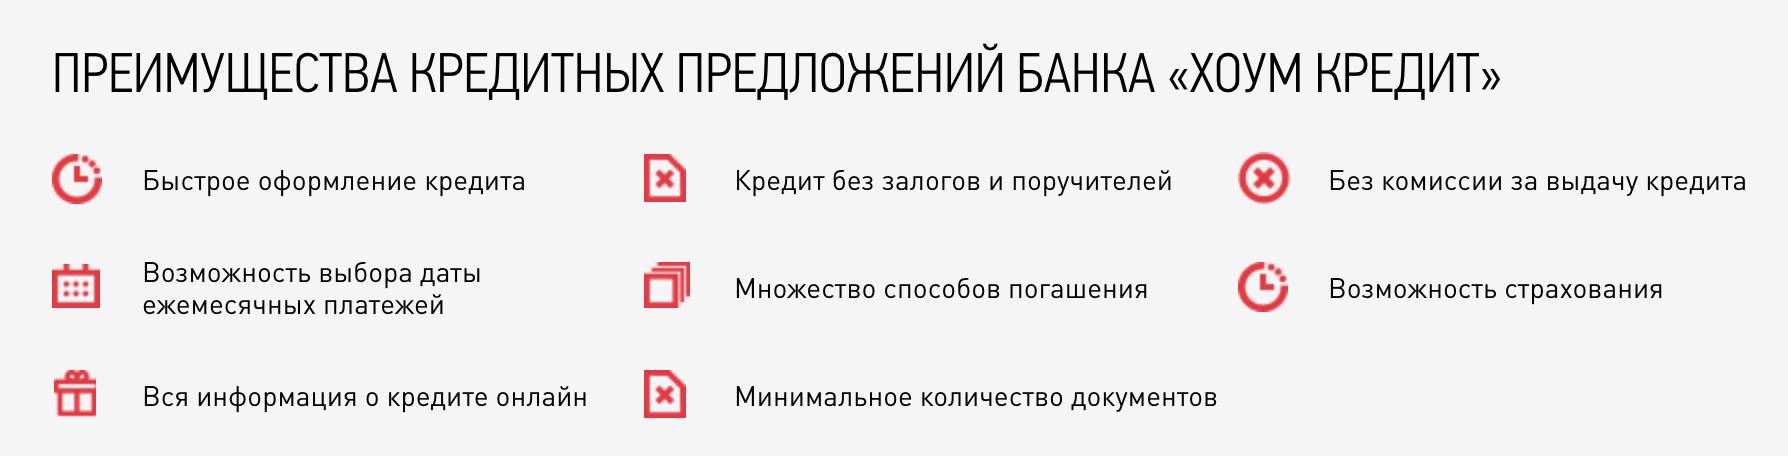 Кредит до зарплаты онлайн vam-groshi.com.ua